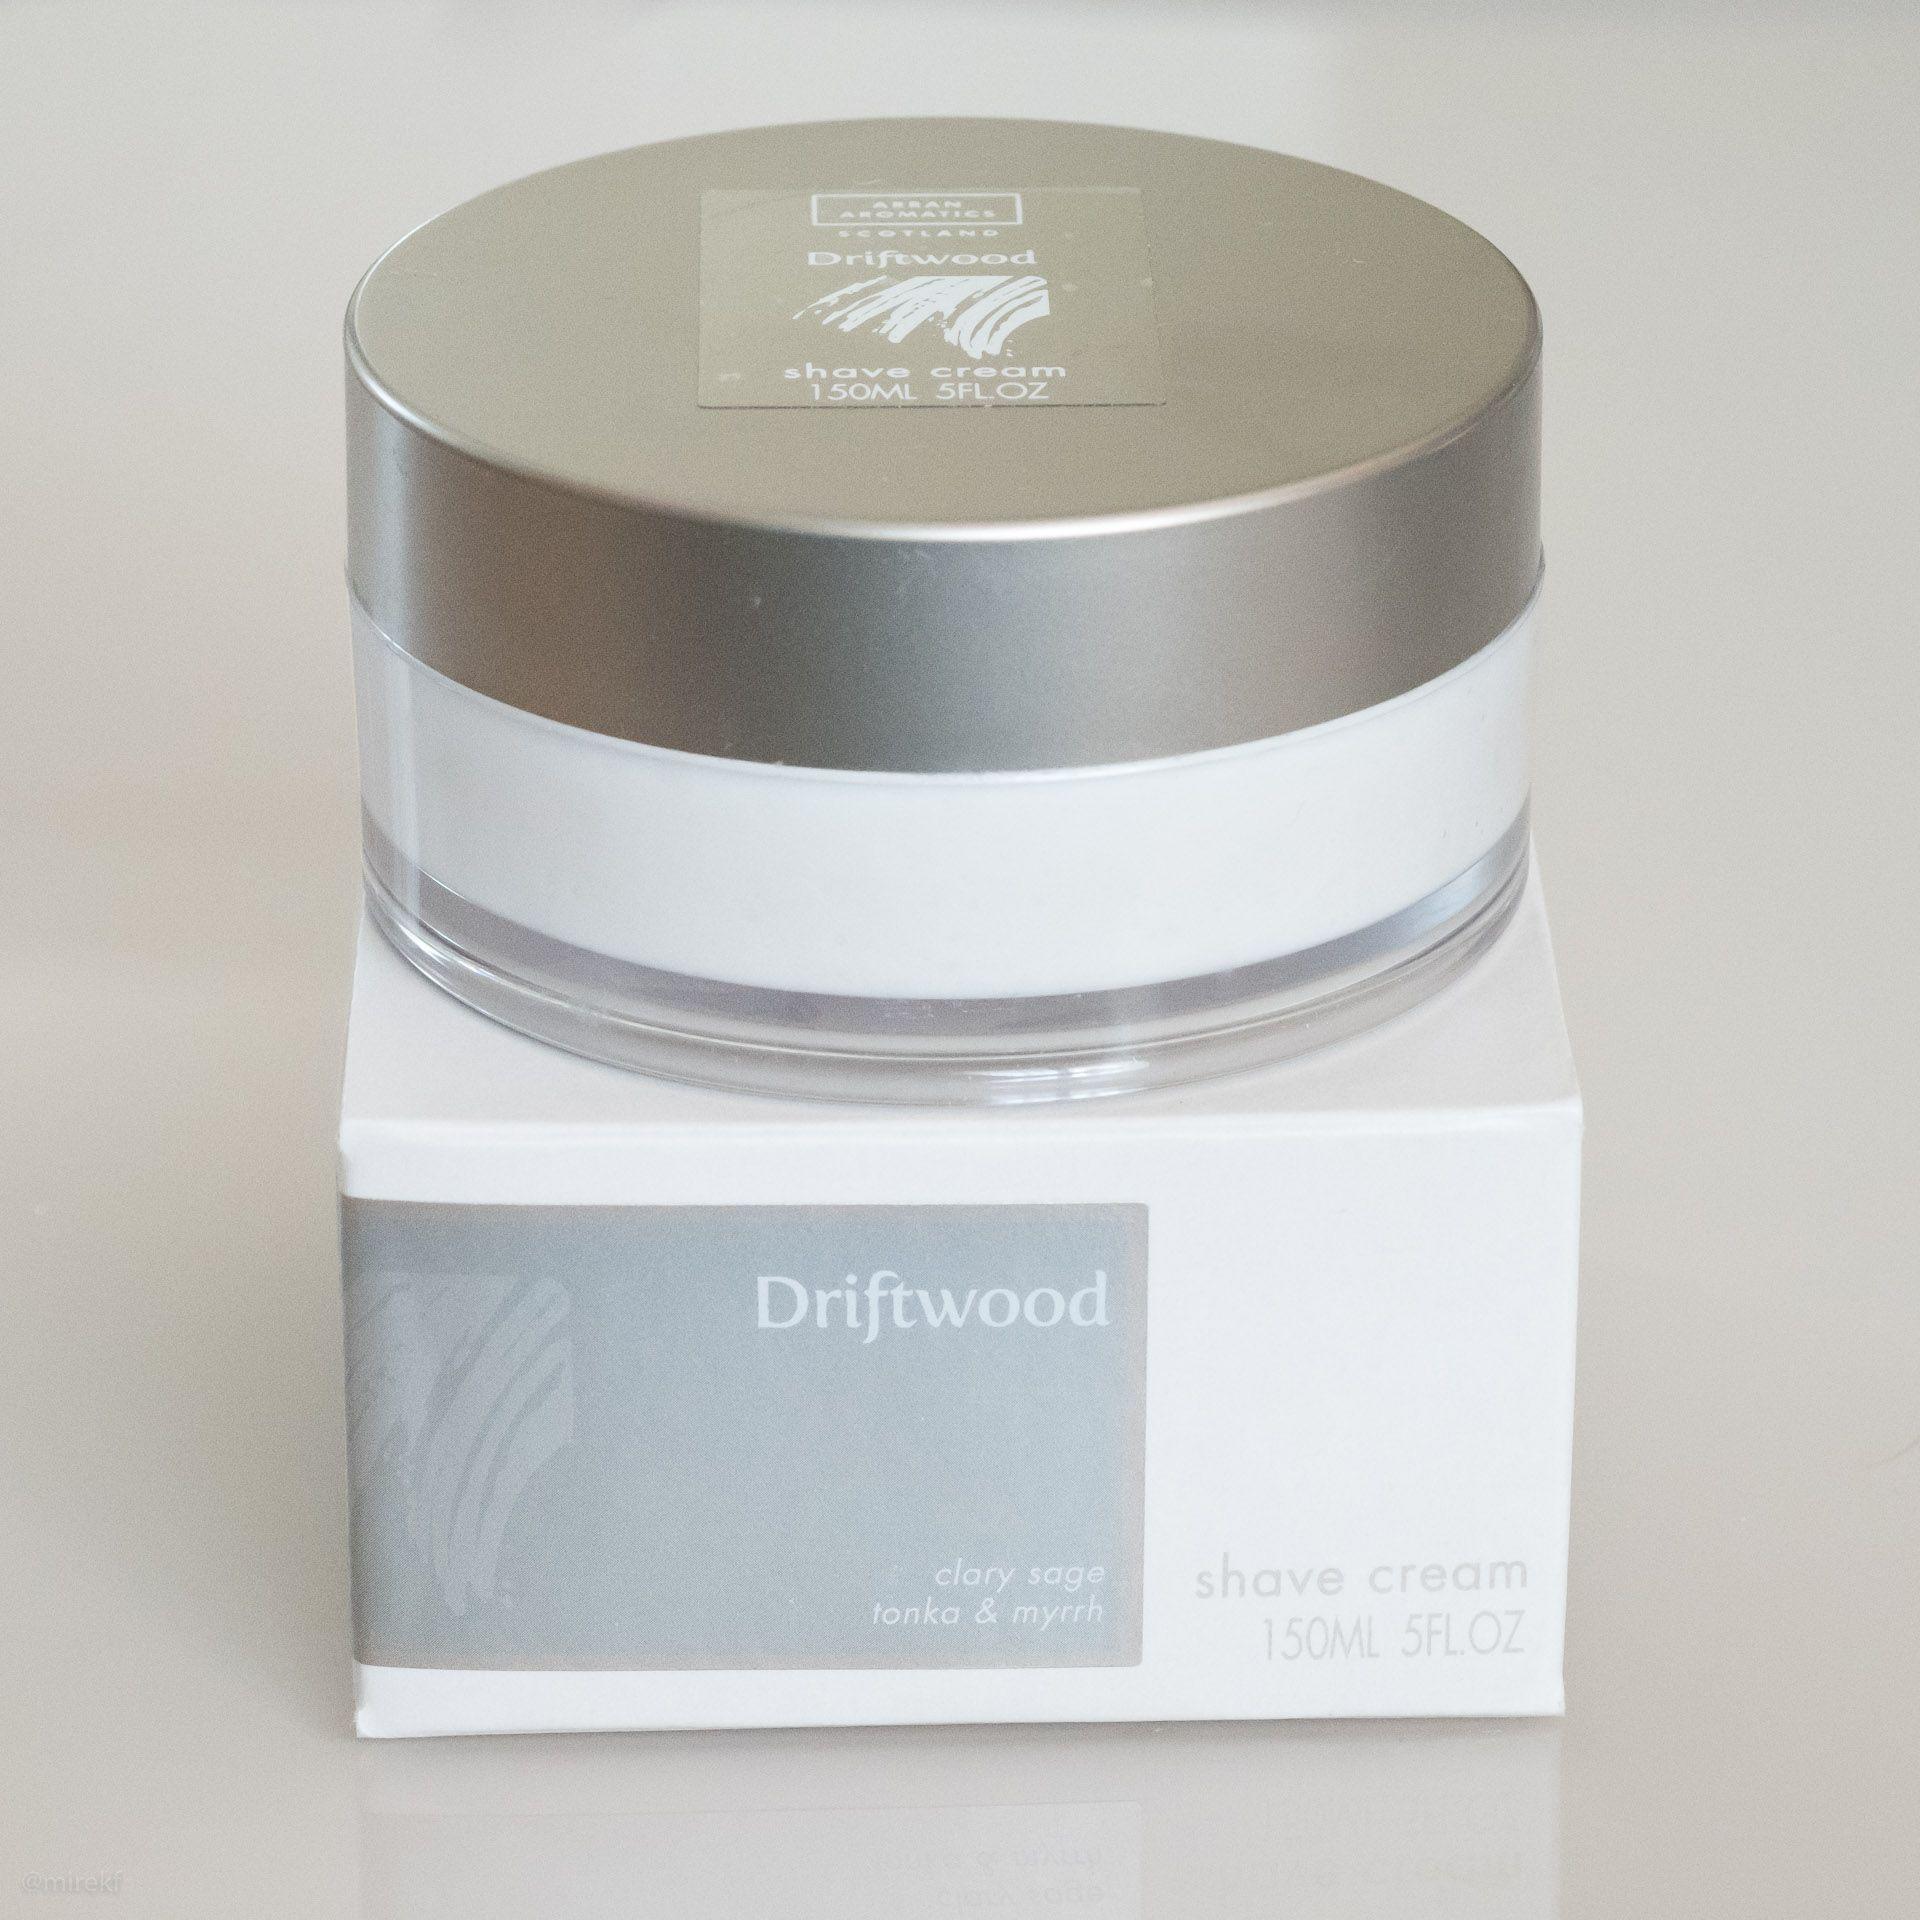 You are currently viewing Arran Aromatics Driftwood Shaving Cream – recenzja kremu do golenia